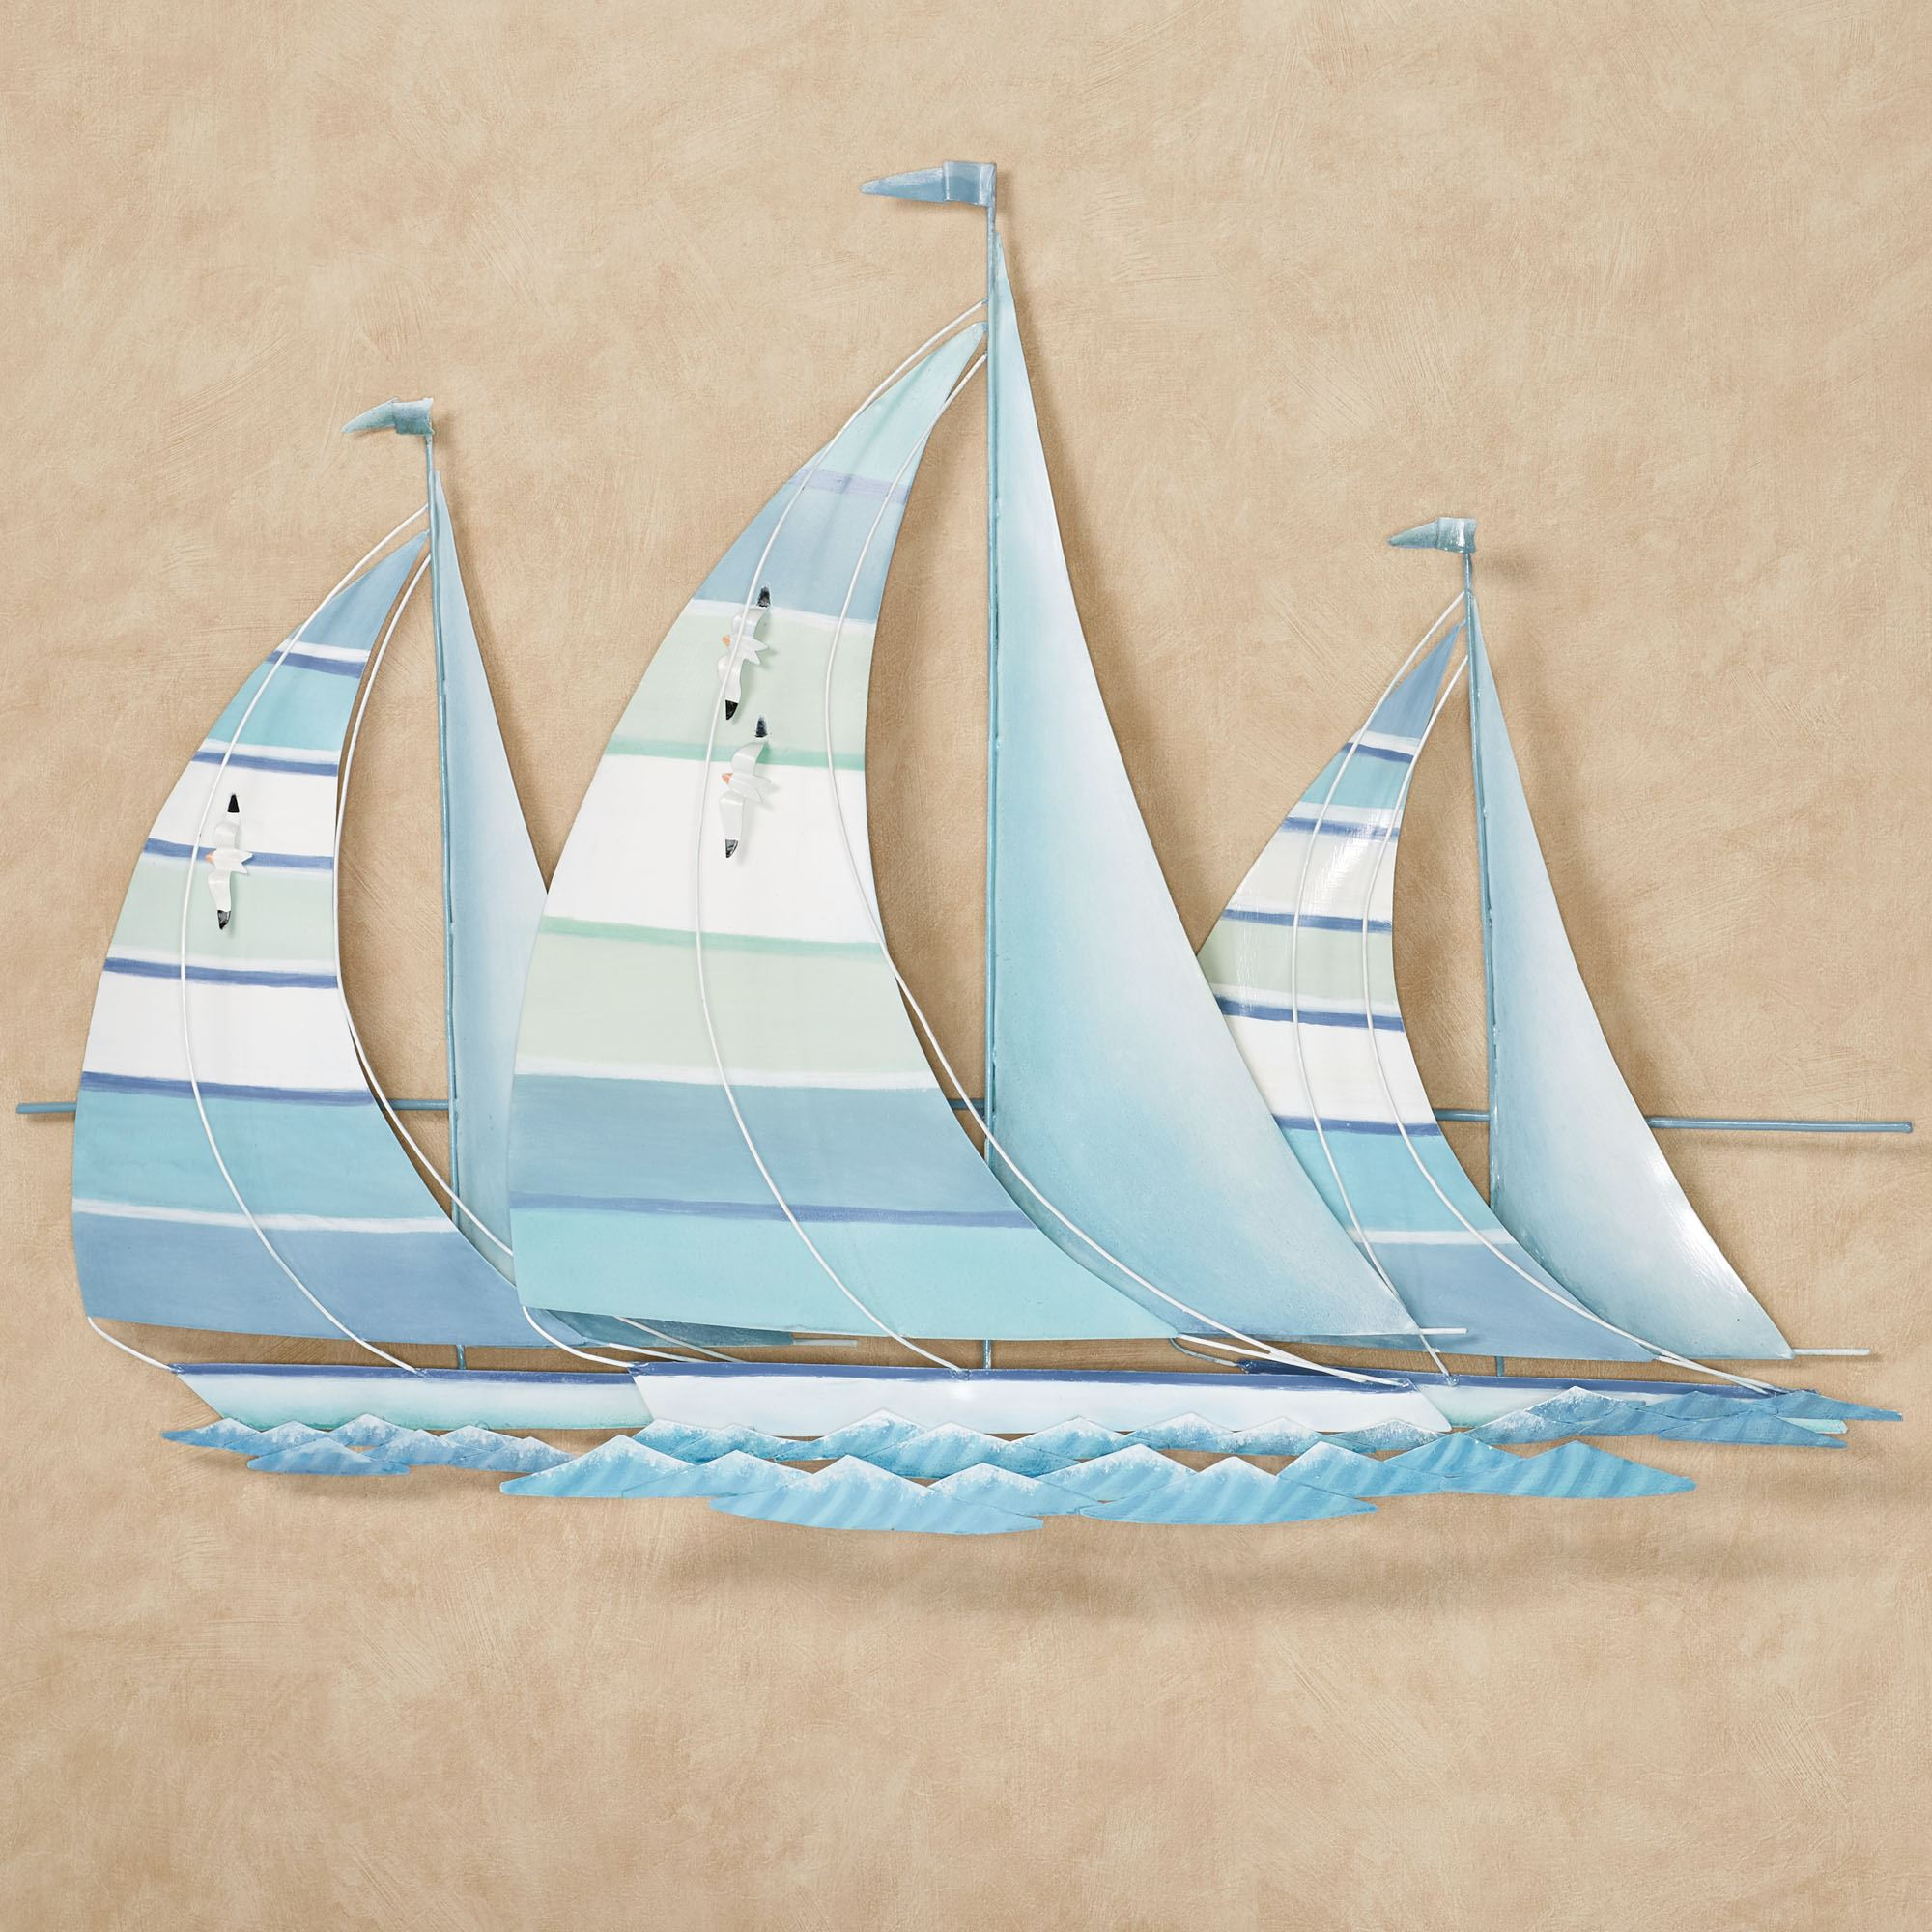 Regatta Finish Line Blue Green Metal Sailboat Wall Sculpture